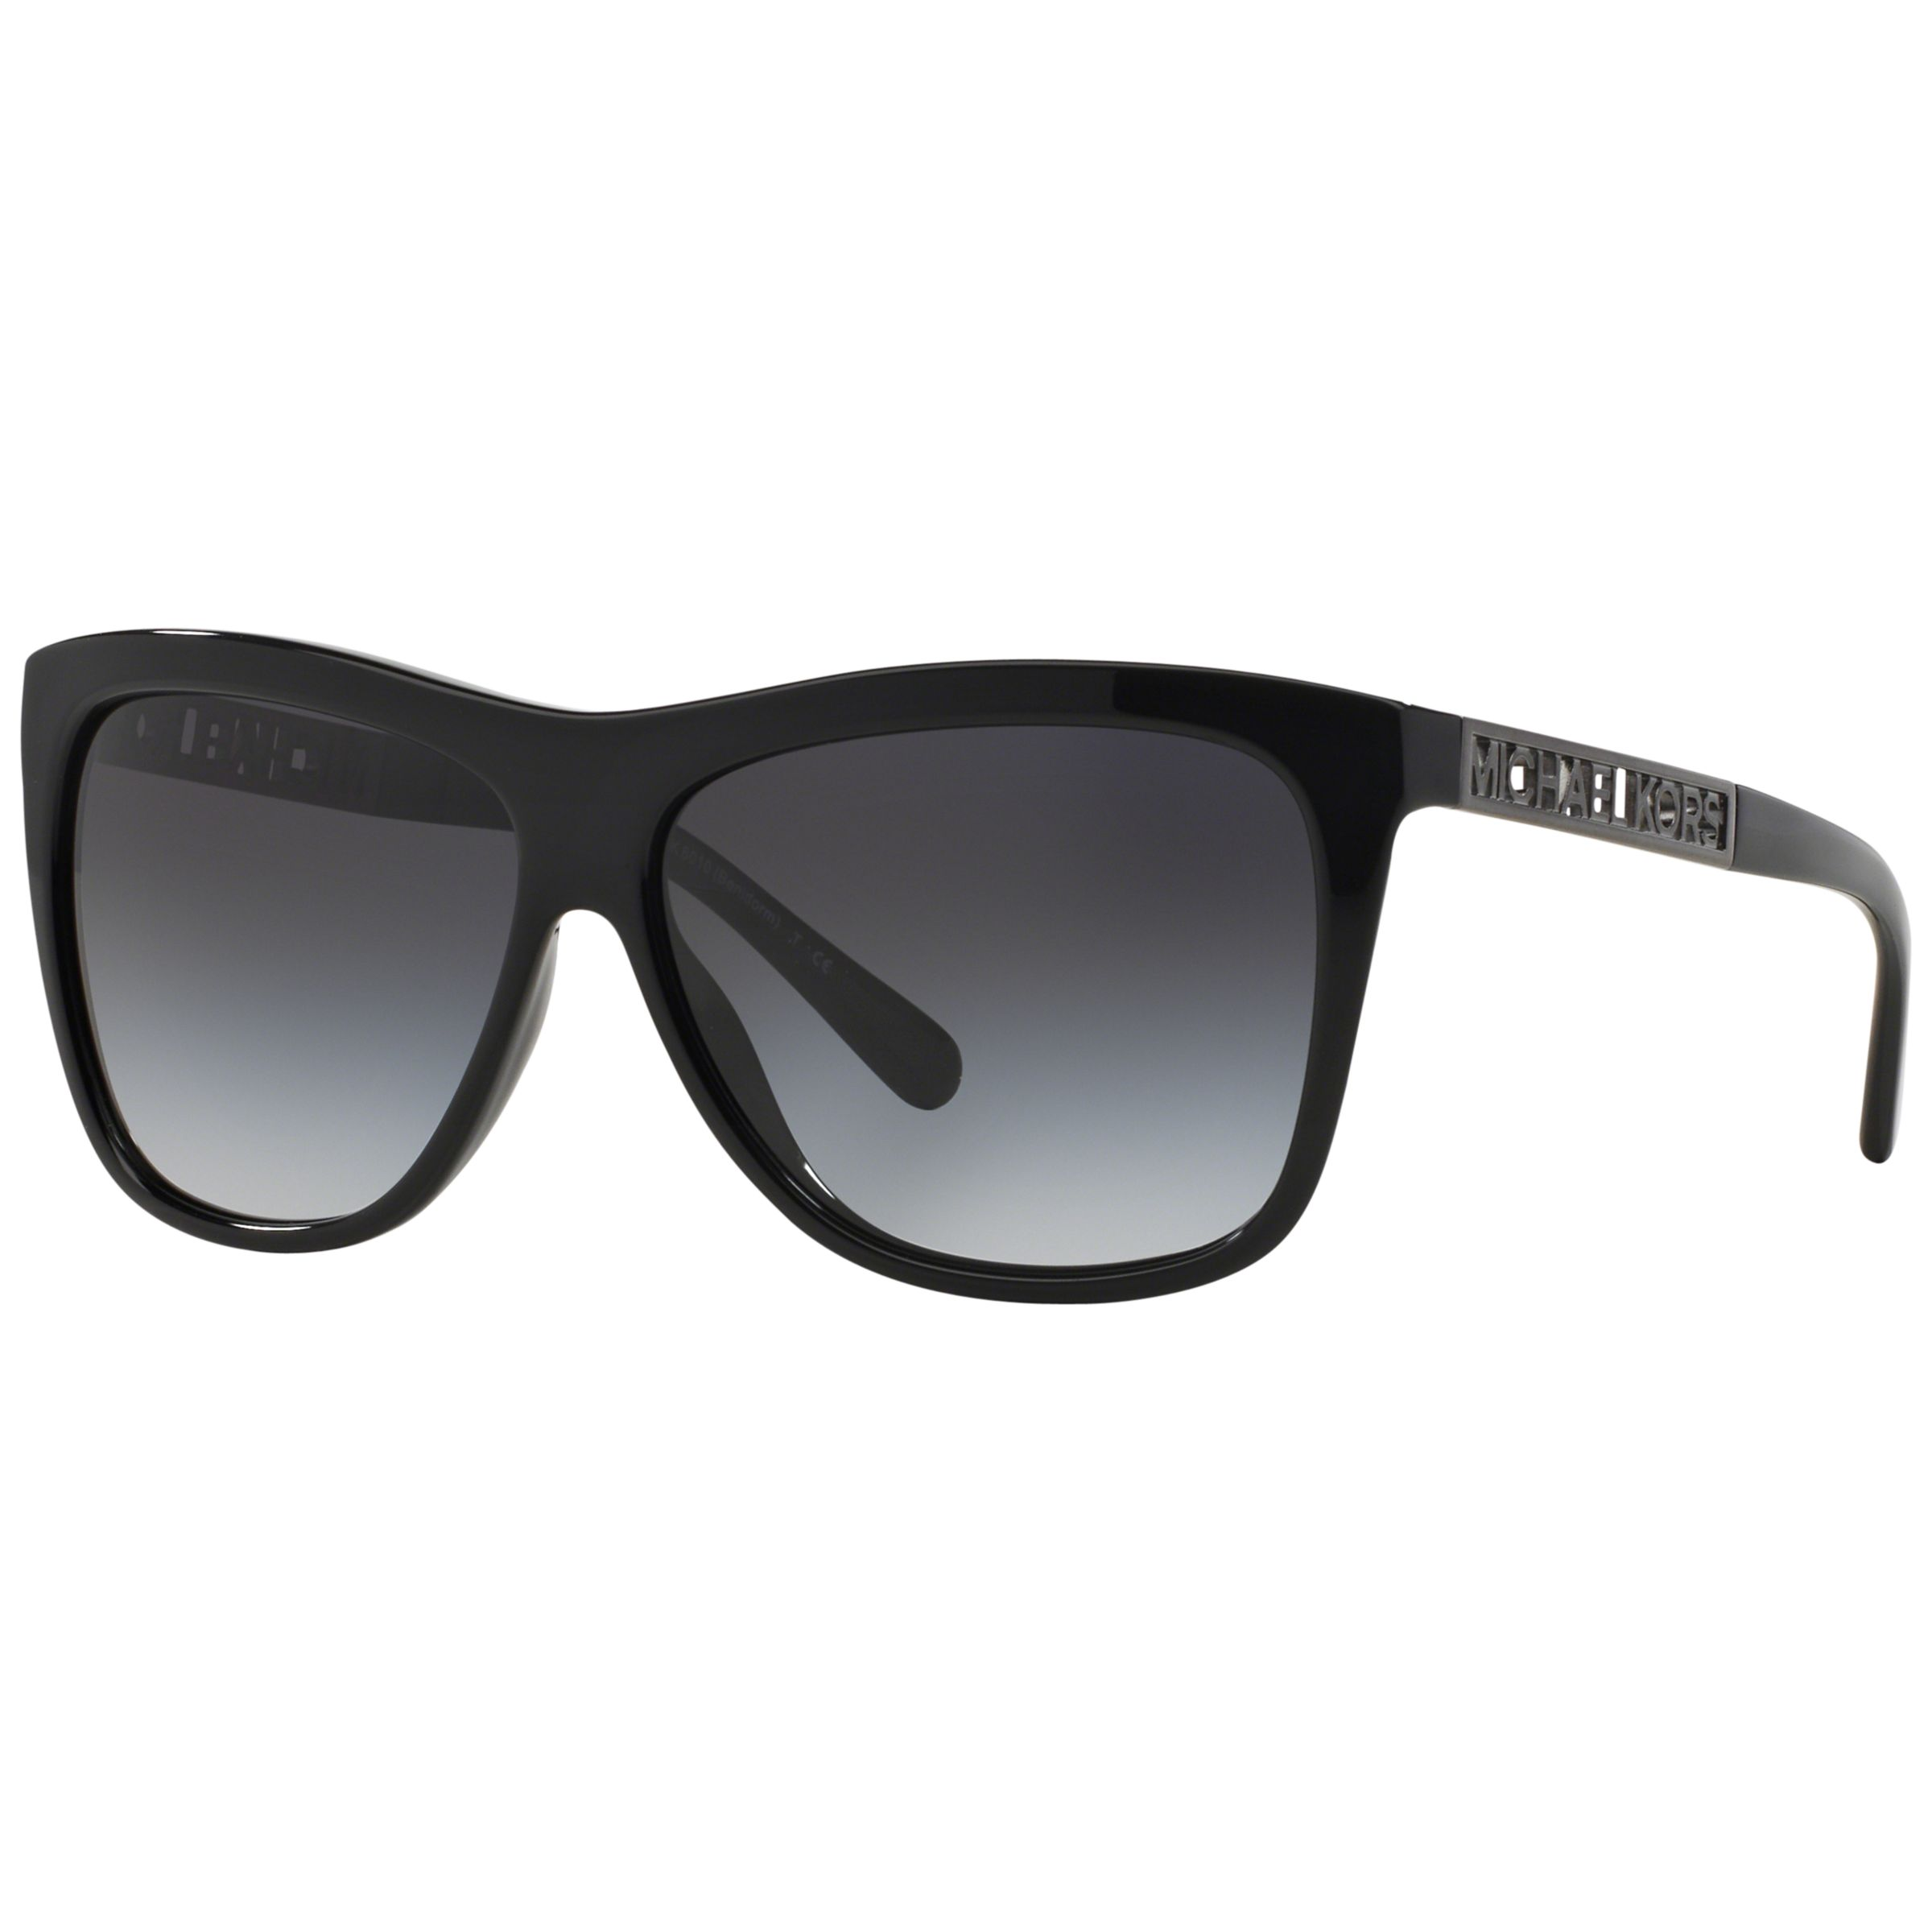 2dd3ce4c39 Michael Kors MK6010 Benidorm Square Sunglasses at John Lewis   Partners